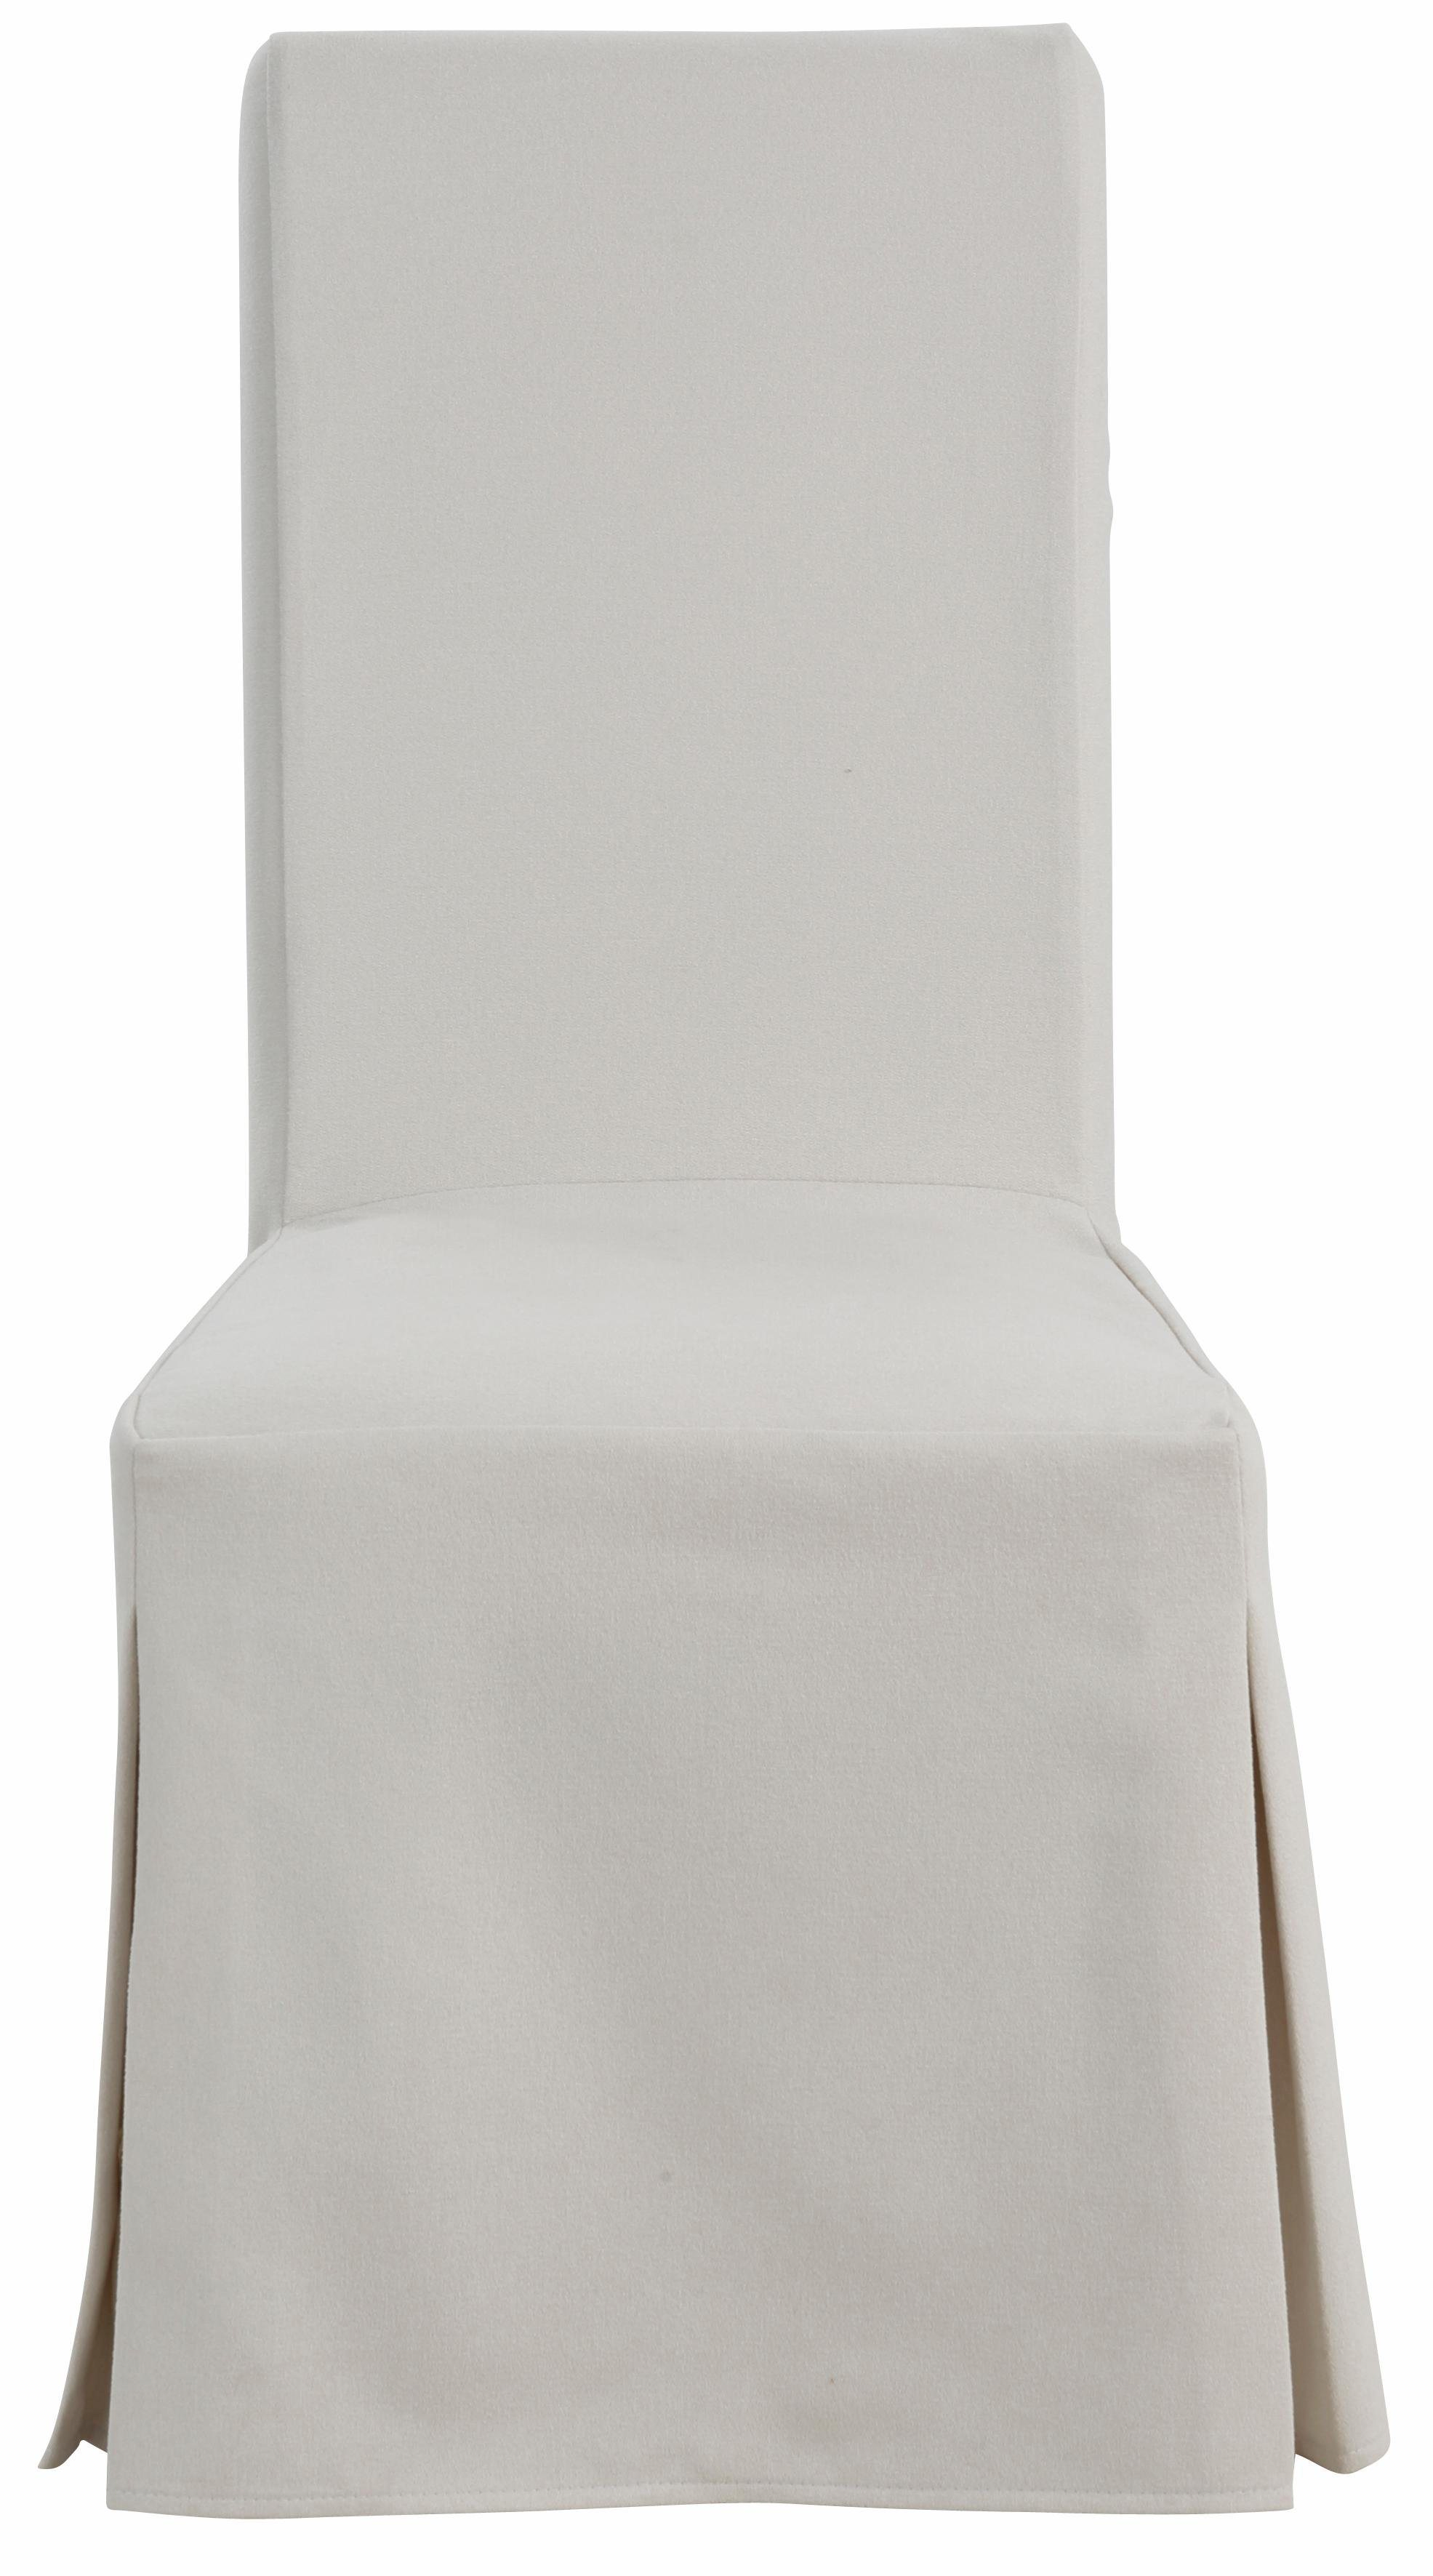 39 sparen home affaire stuhl roko husse nur 159 00 cherry m bel otto. Black Bedroom Furniture Sets. Home Design Ideas